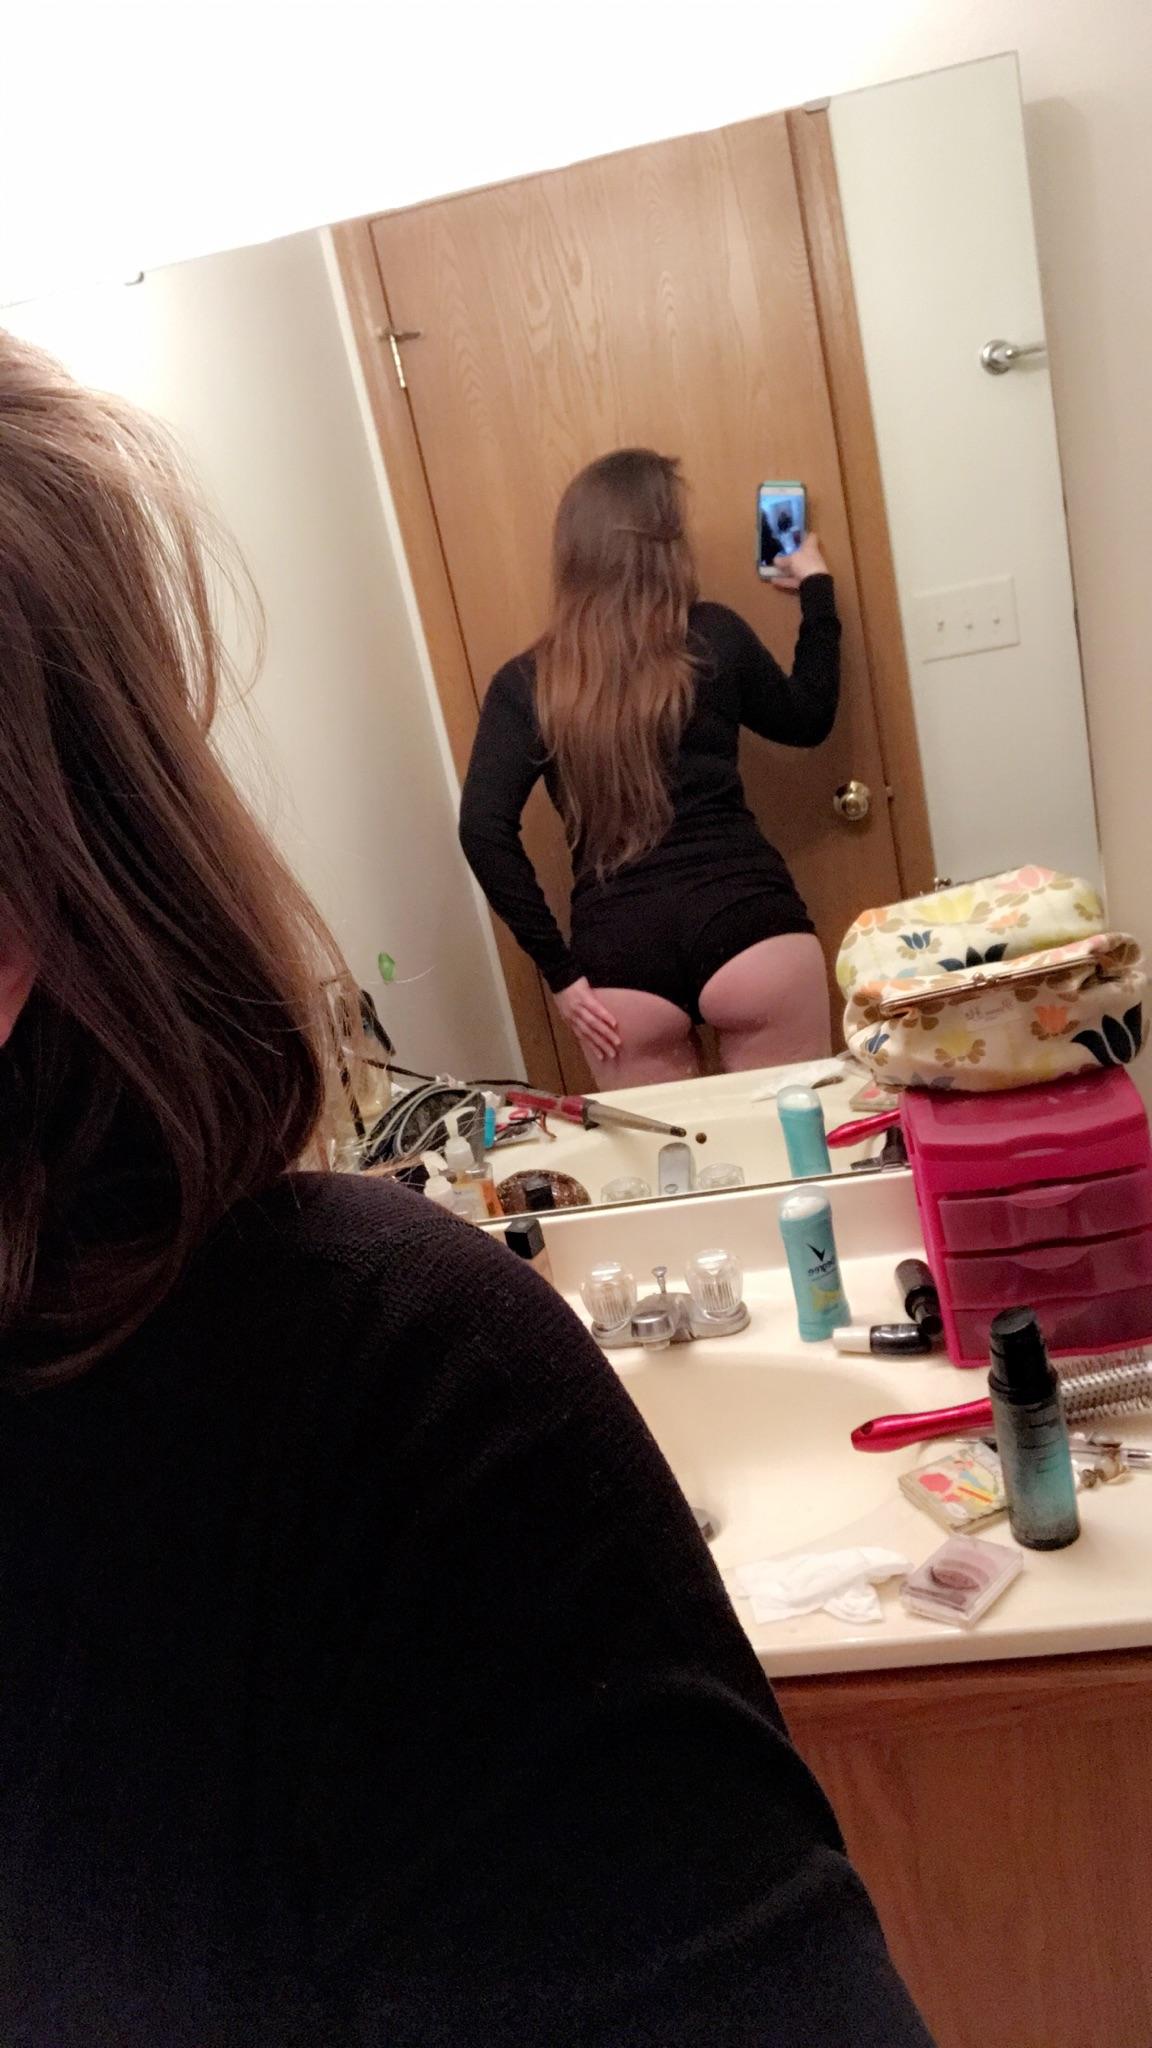 My Preggo Side Girl | XNXX Adult Forum